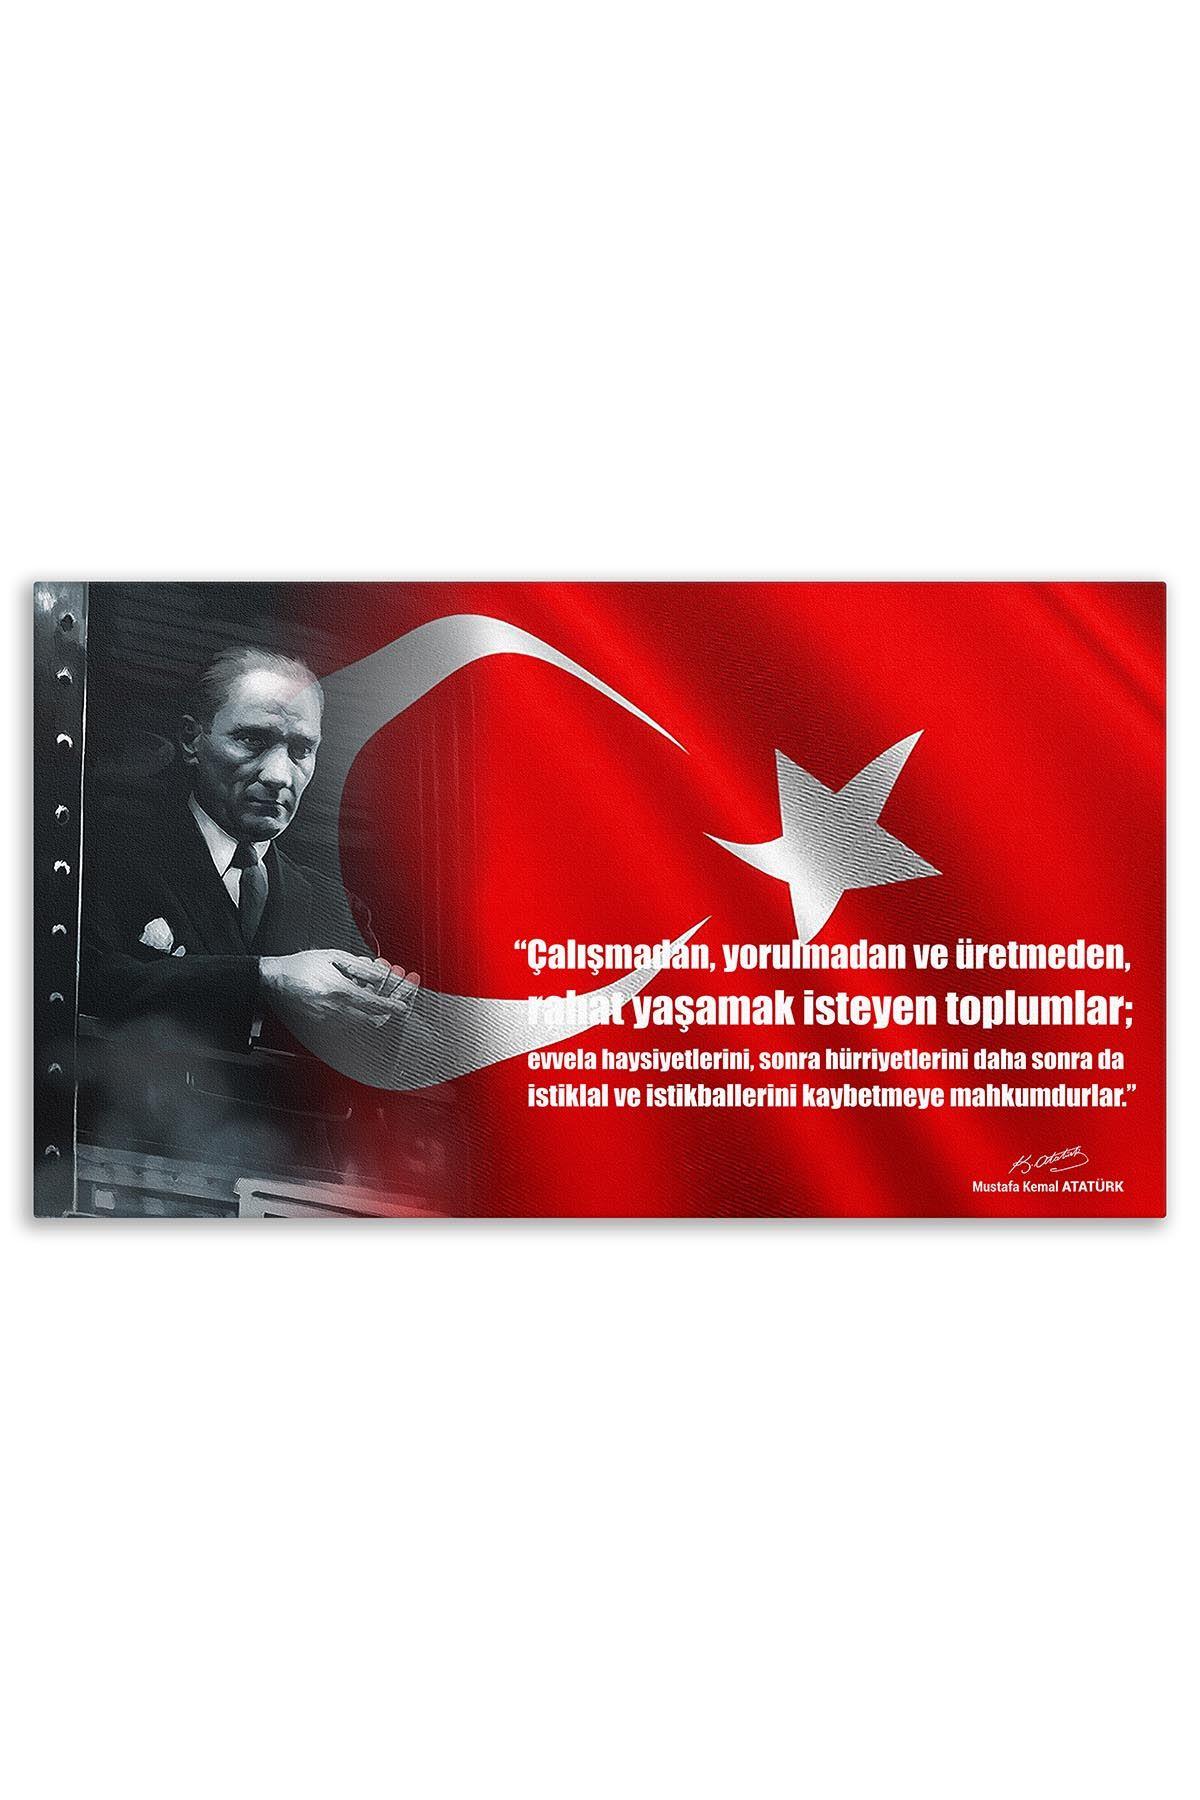 Atatürk Canvas Board | Printed Canvas Board | Customized Canvas Board |Digital Printing